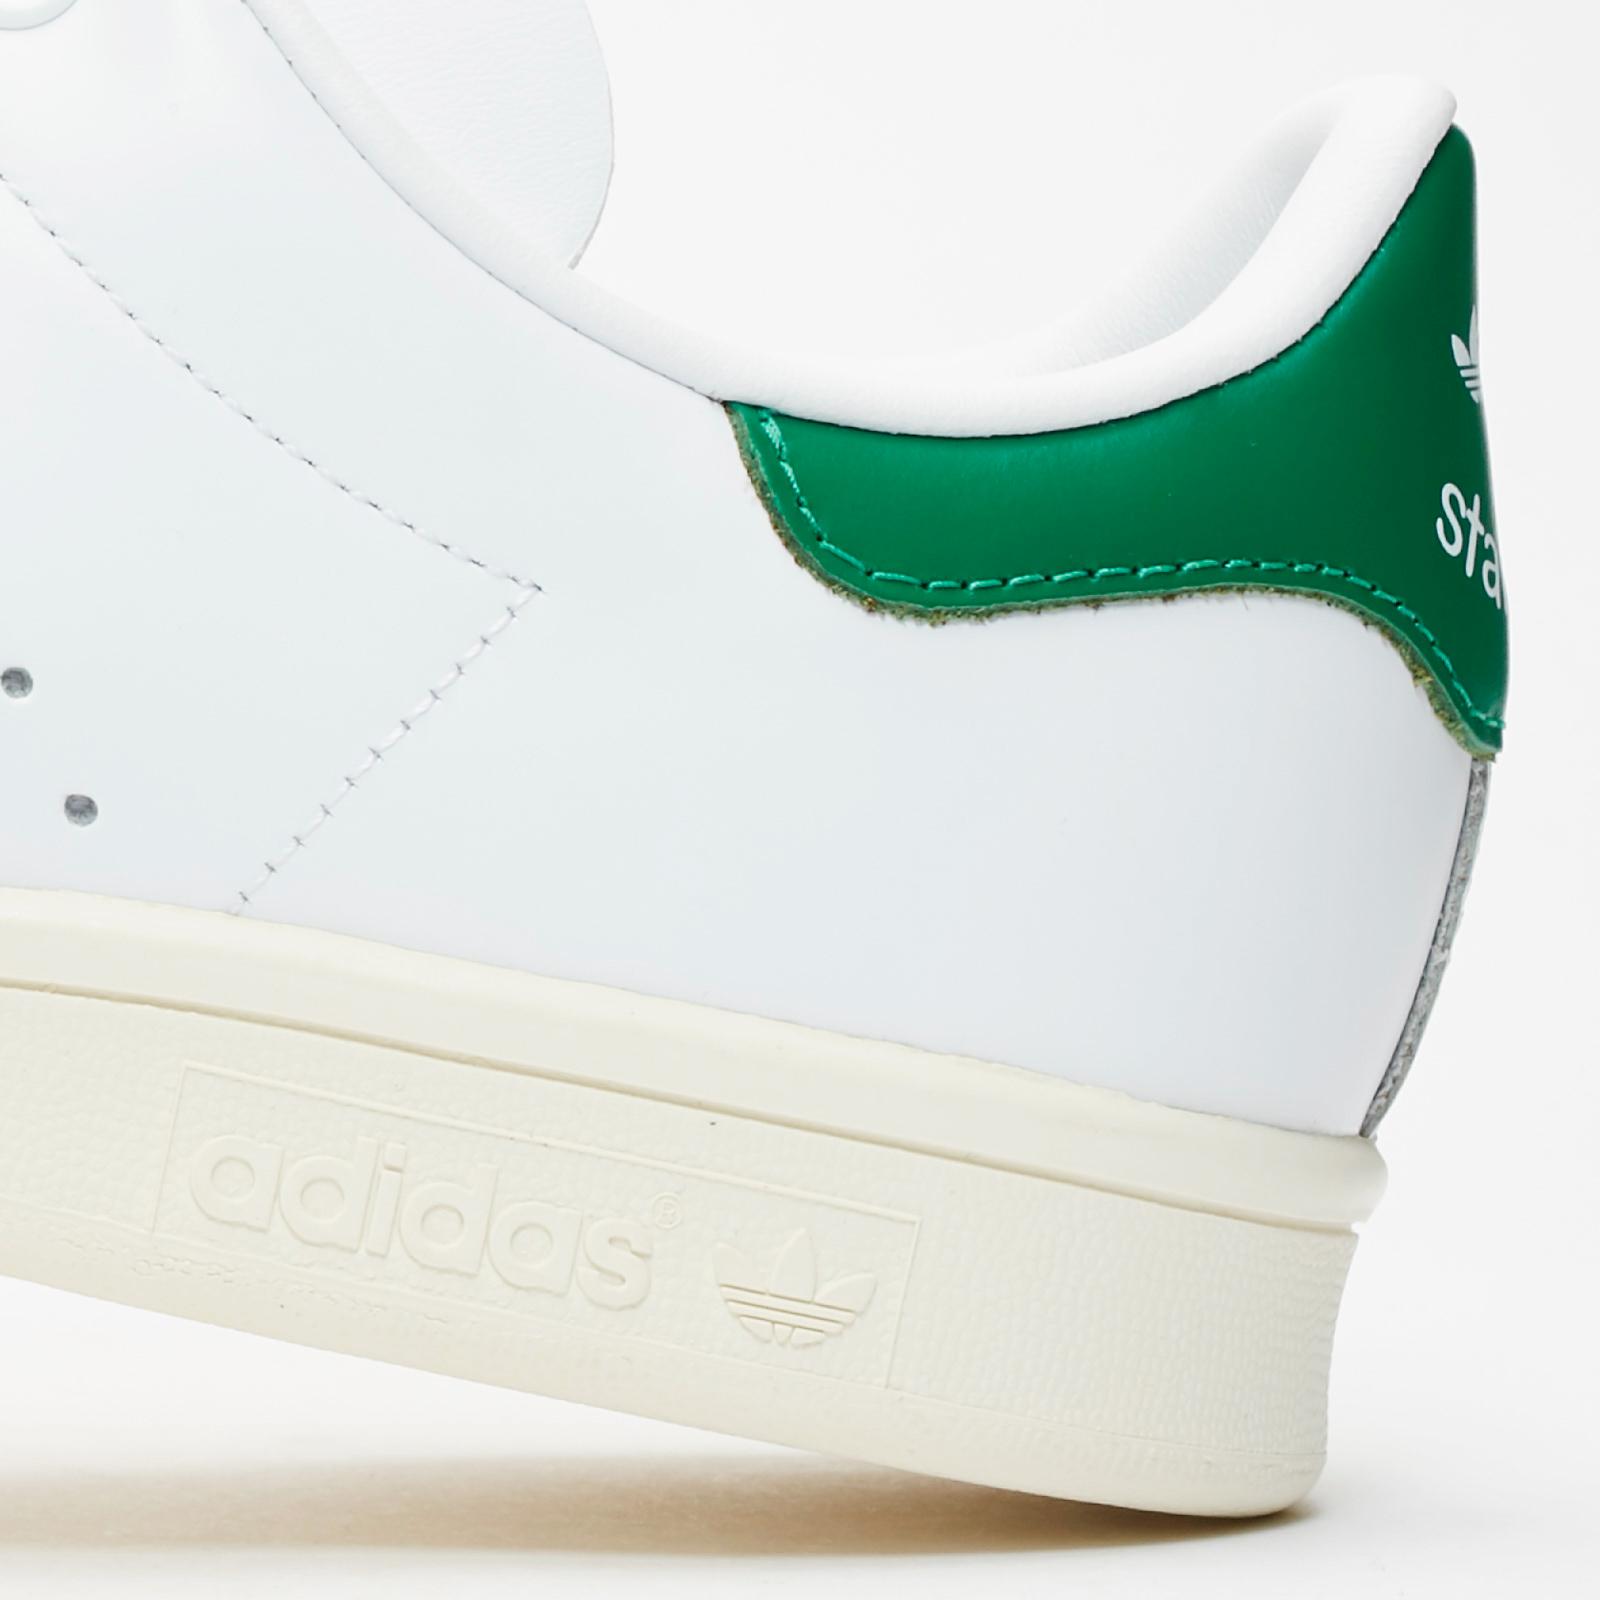 ADIDAS Stan Smith Socken Sneaker 38 23 kaufen auf ricardo.ch